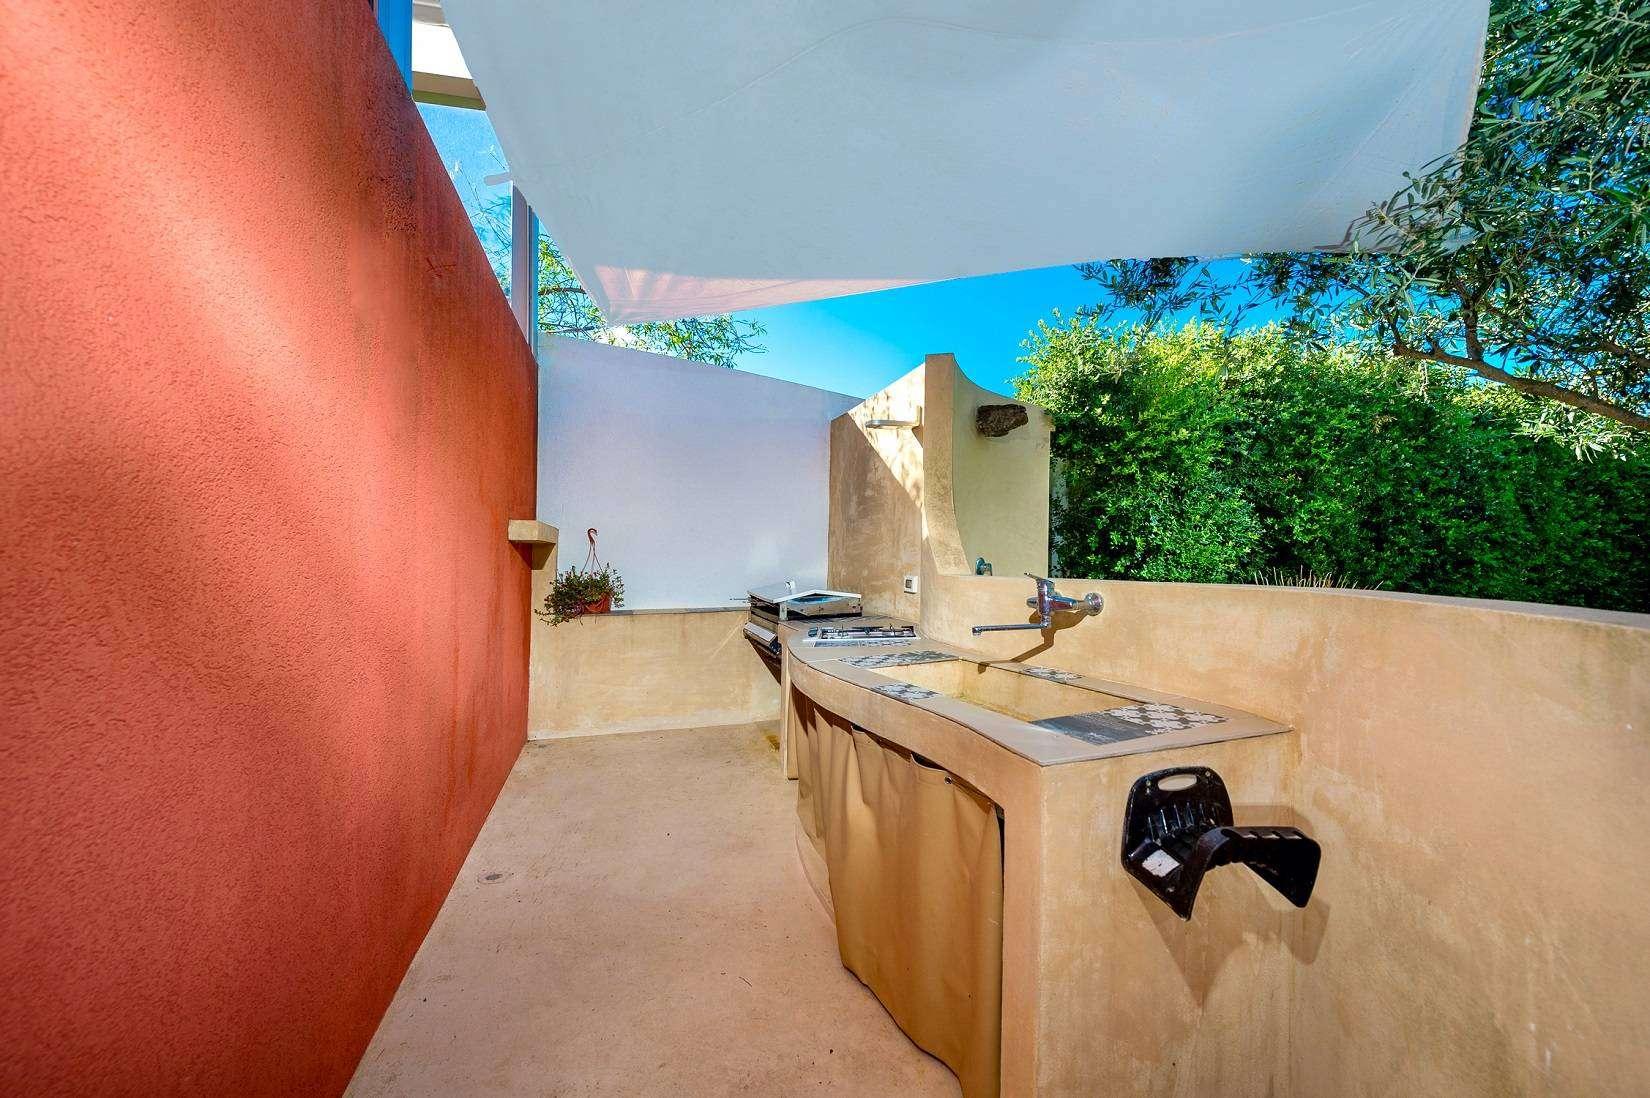 27 Dei Mori outdoor kitchen